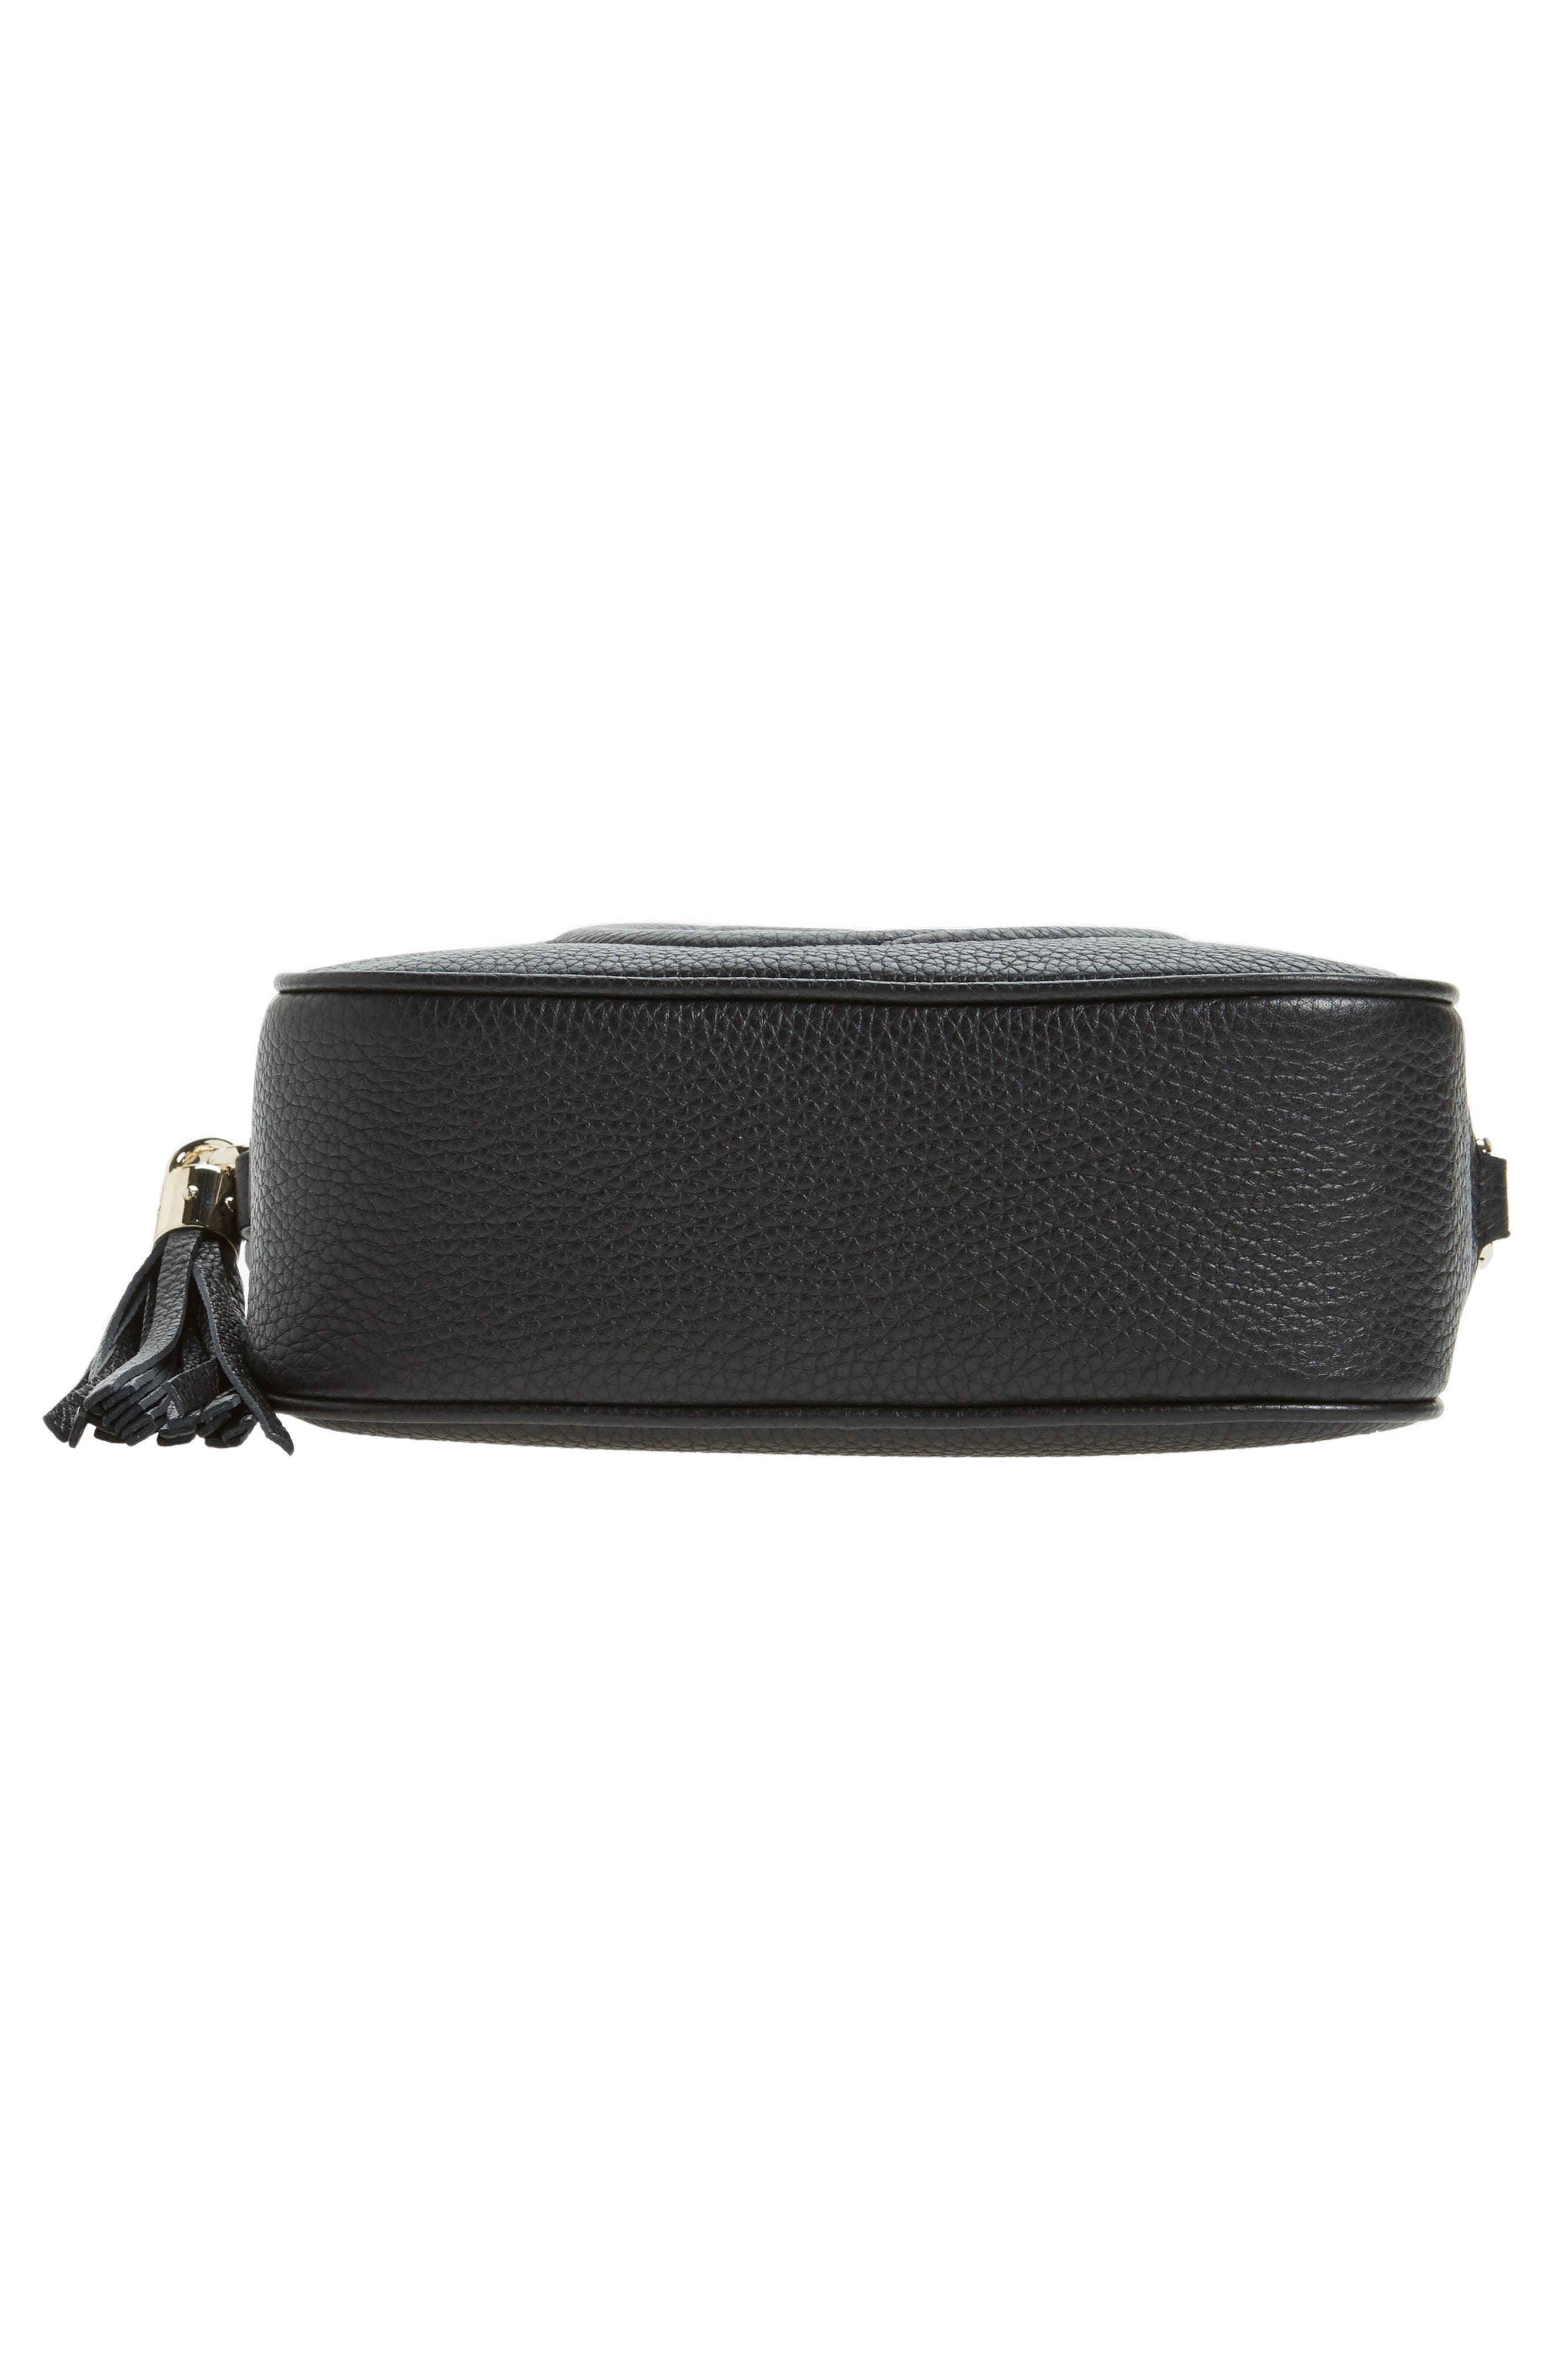 eb975f074947 GUCCI SOHO DISCO LEATHER BAG - BLACK   ModeSens